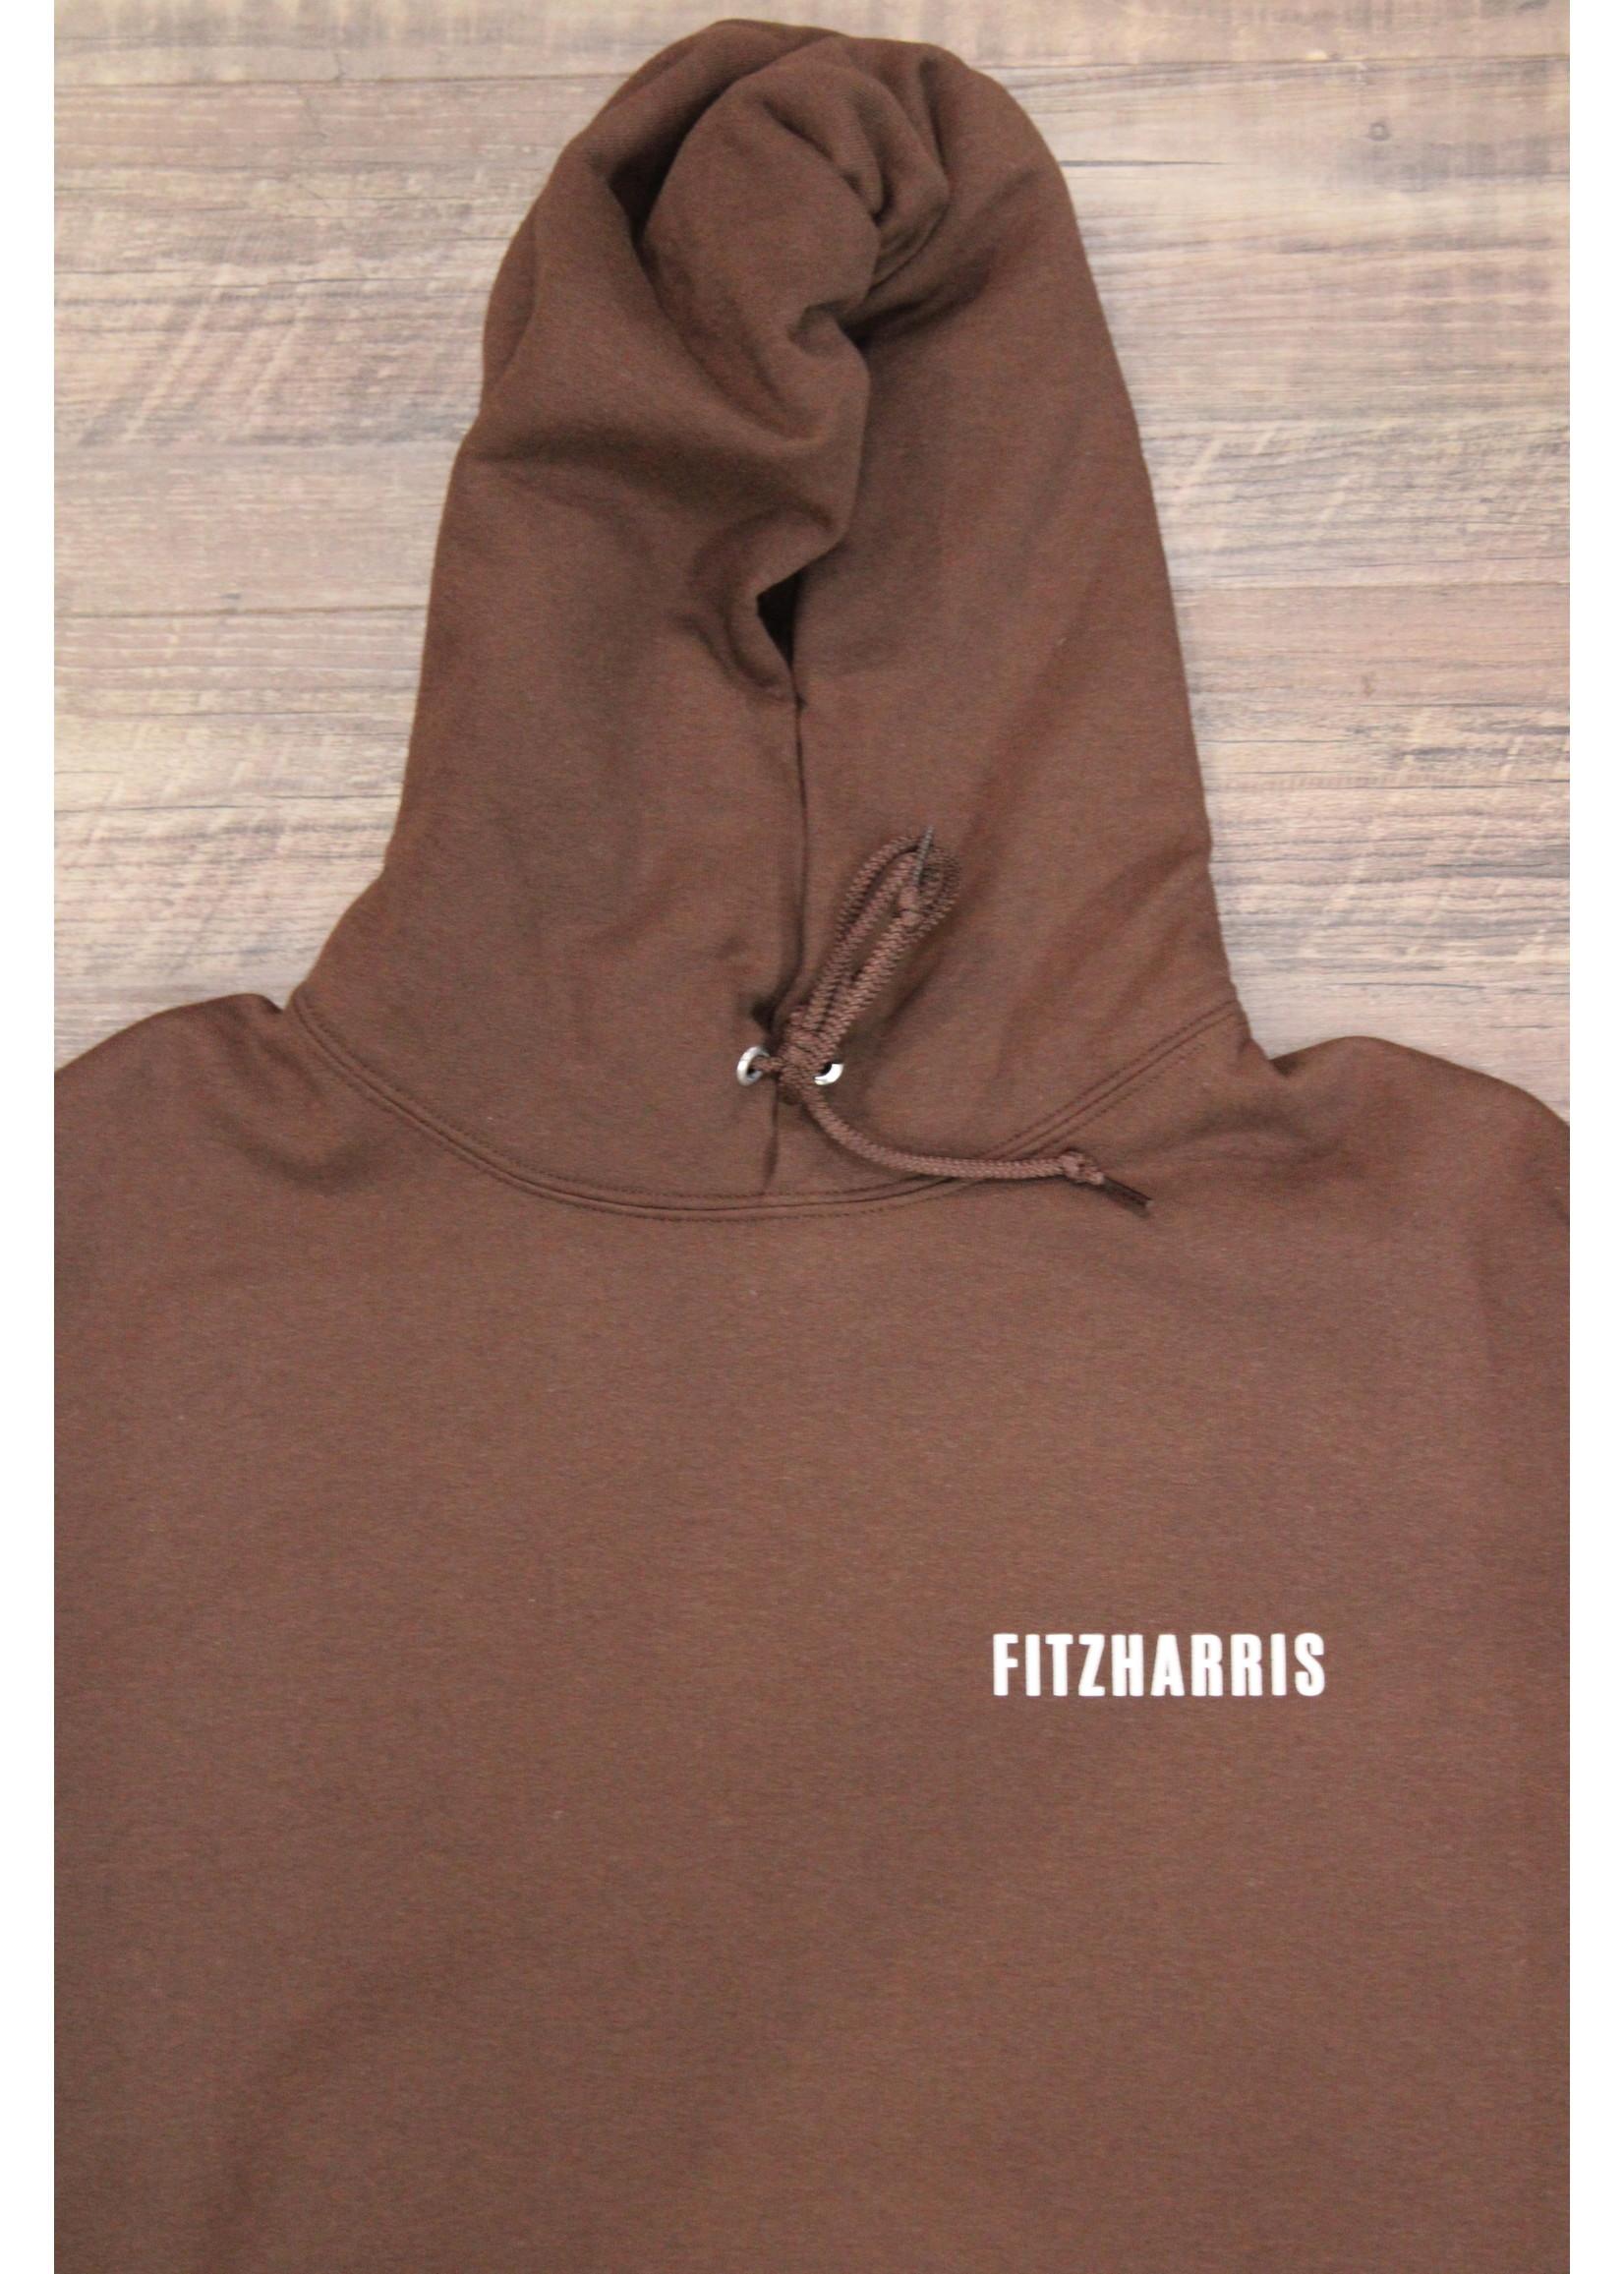 Fitzharris Fitz Wheel Hooded Sweatshirt